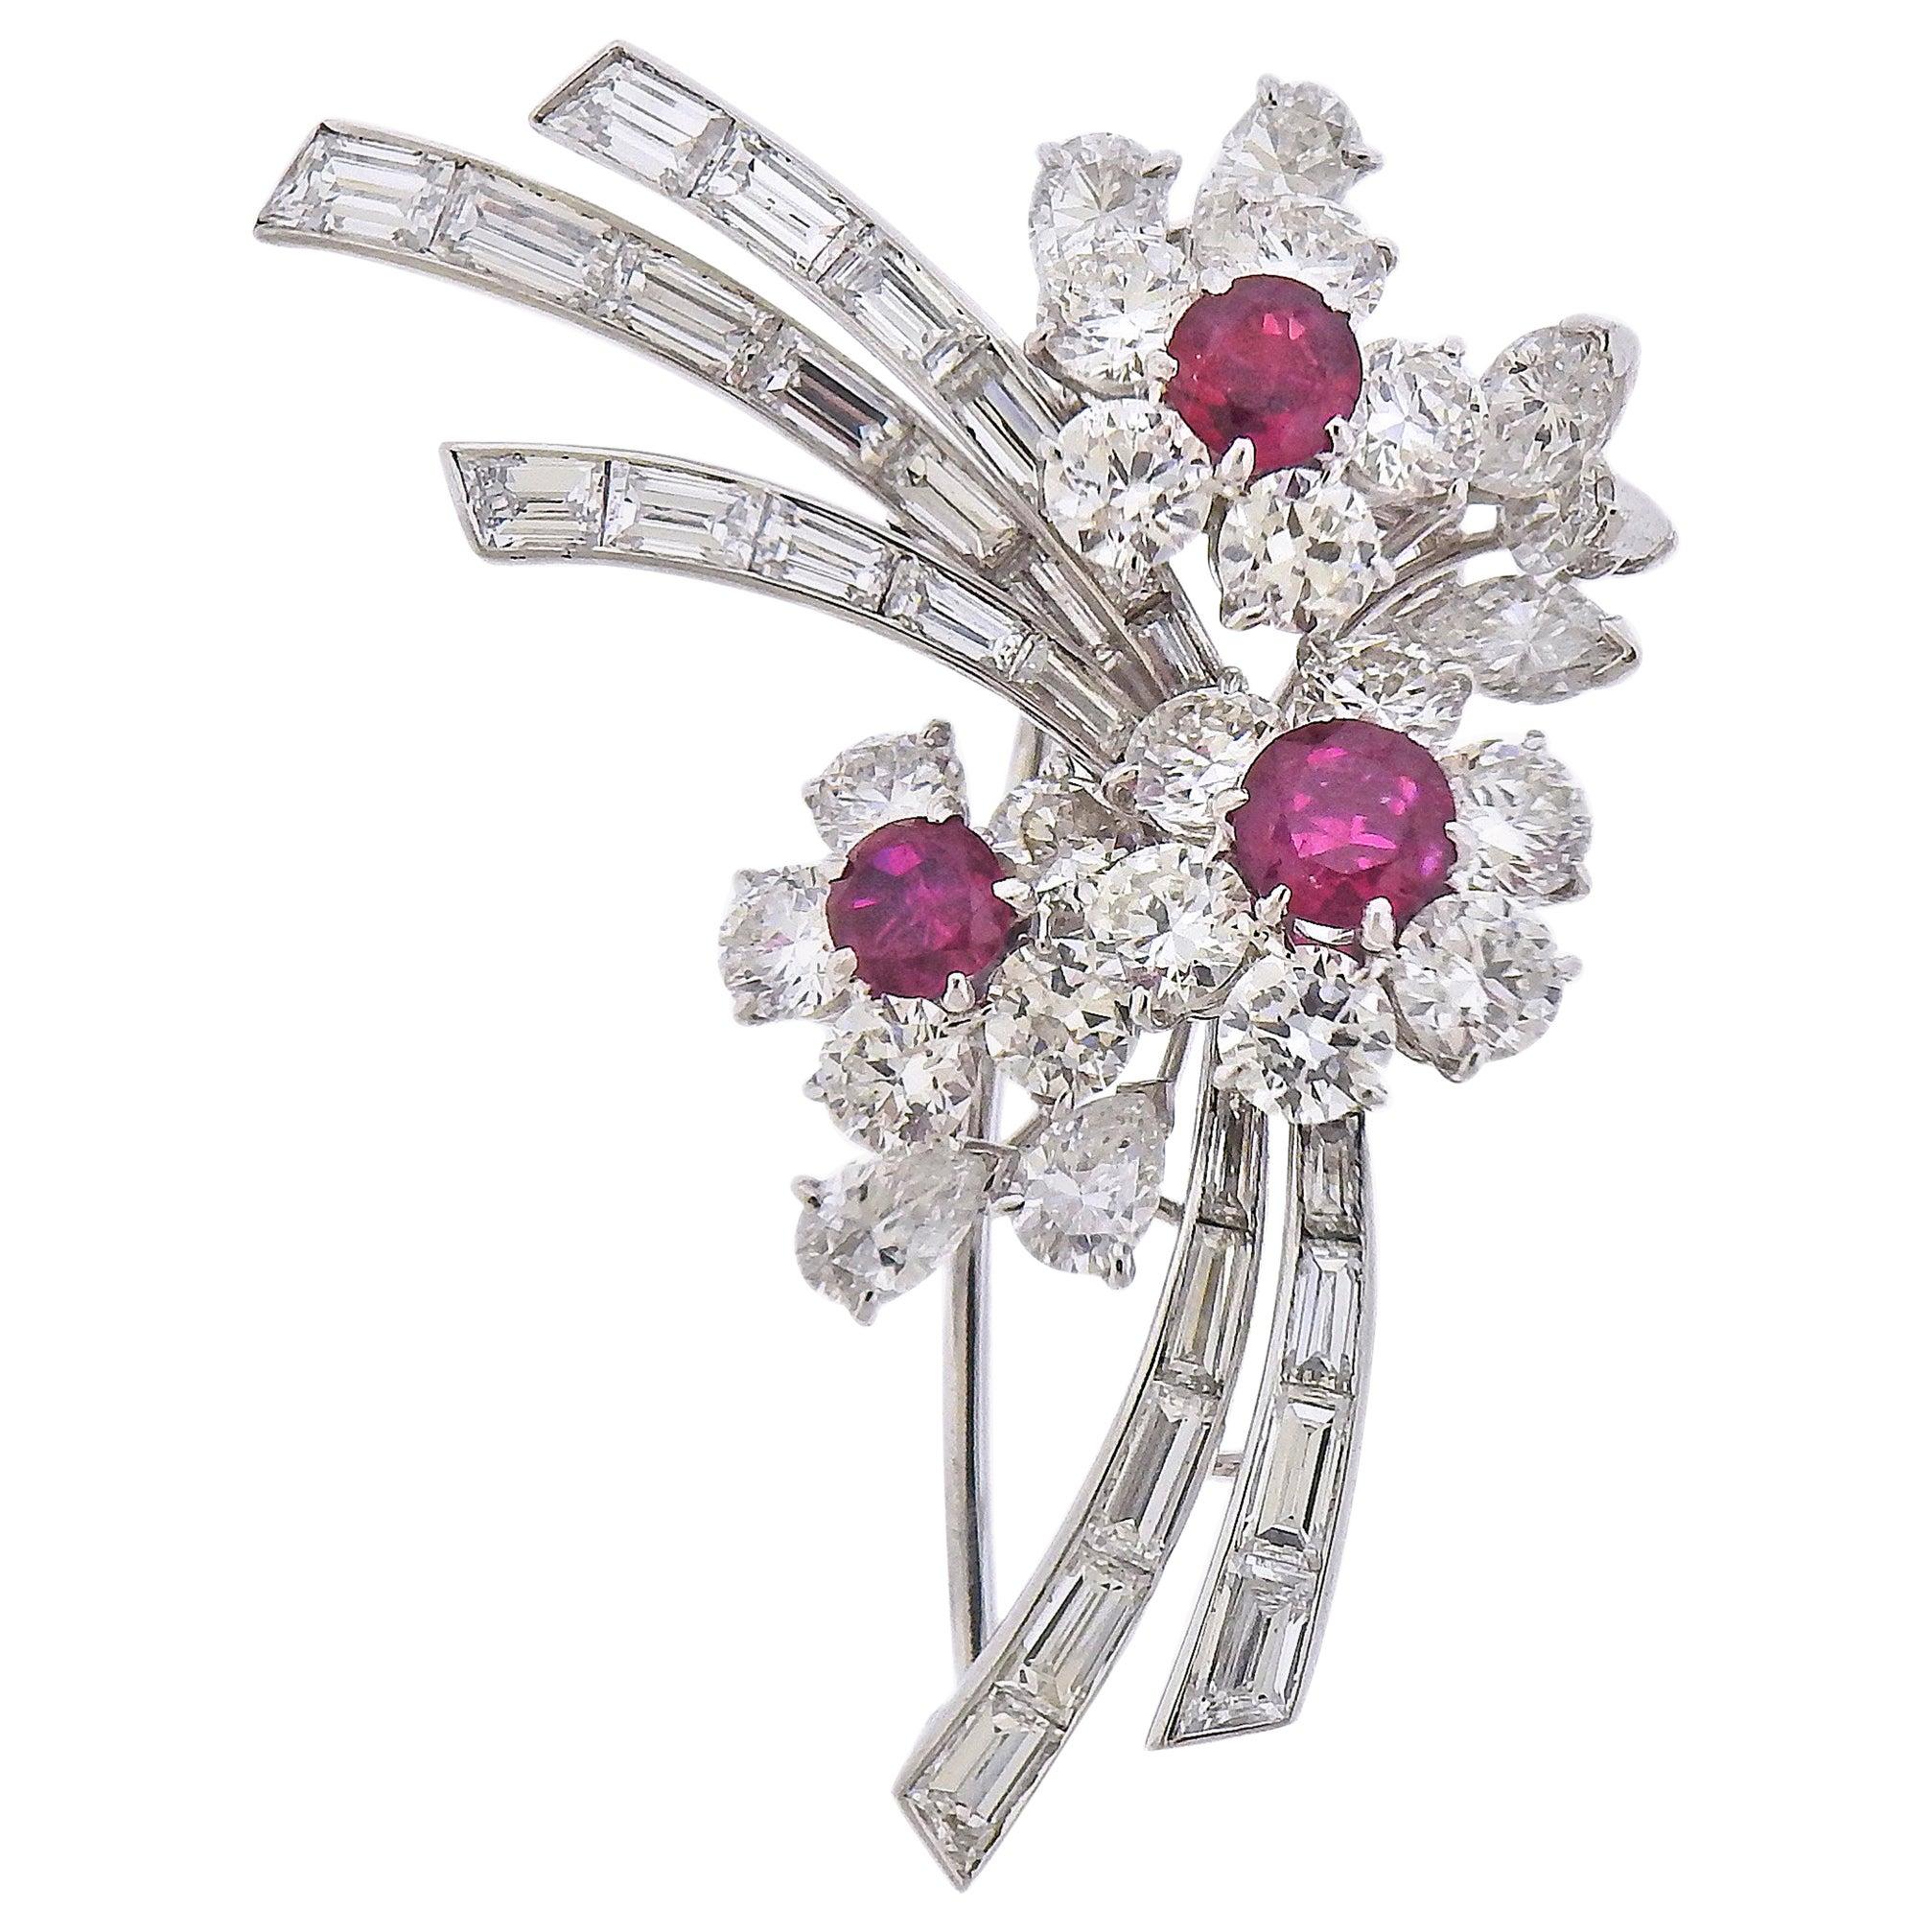 Bulgari Exquisite Ruby and Diamond Platinum Floral Brooch